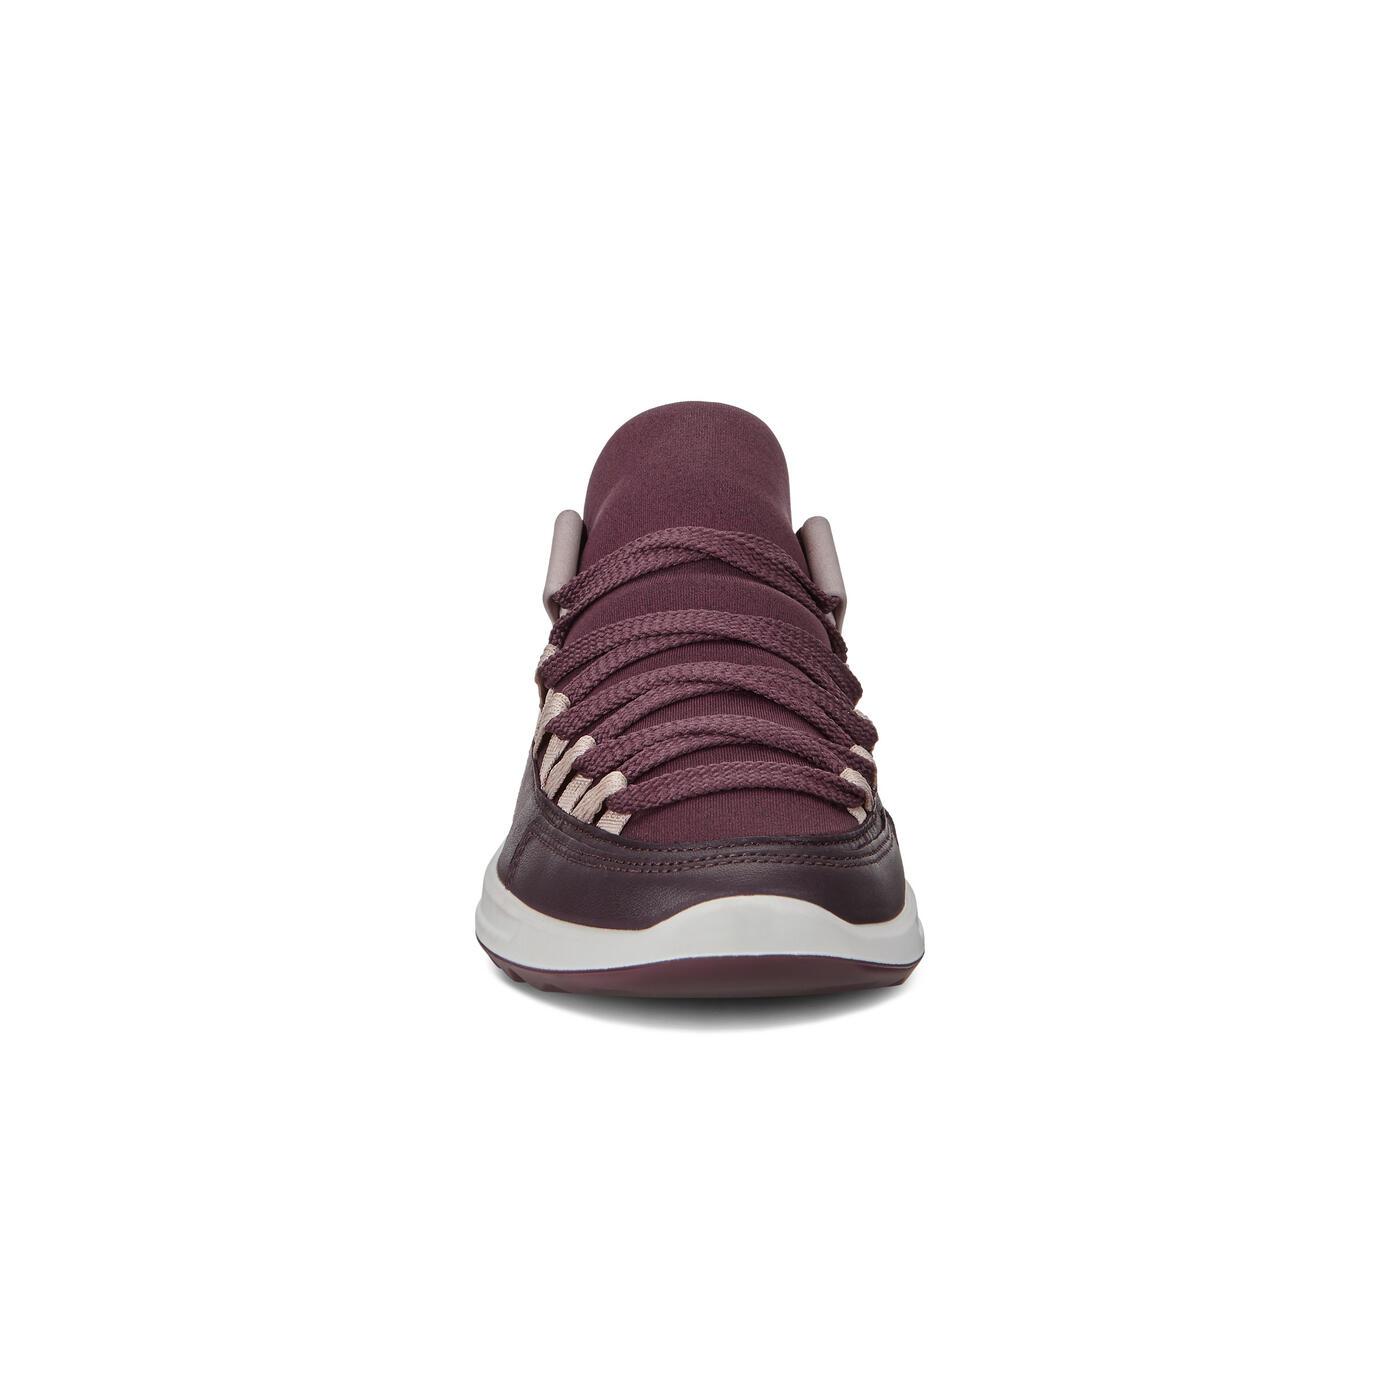 ECCO Flexure Runner II Women's Slip On Sneaker